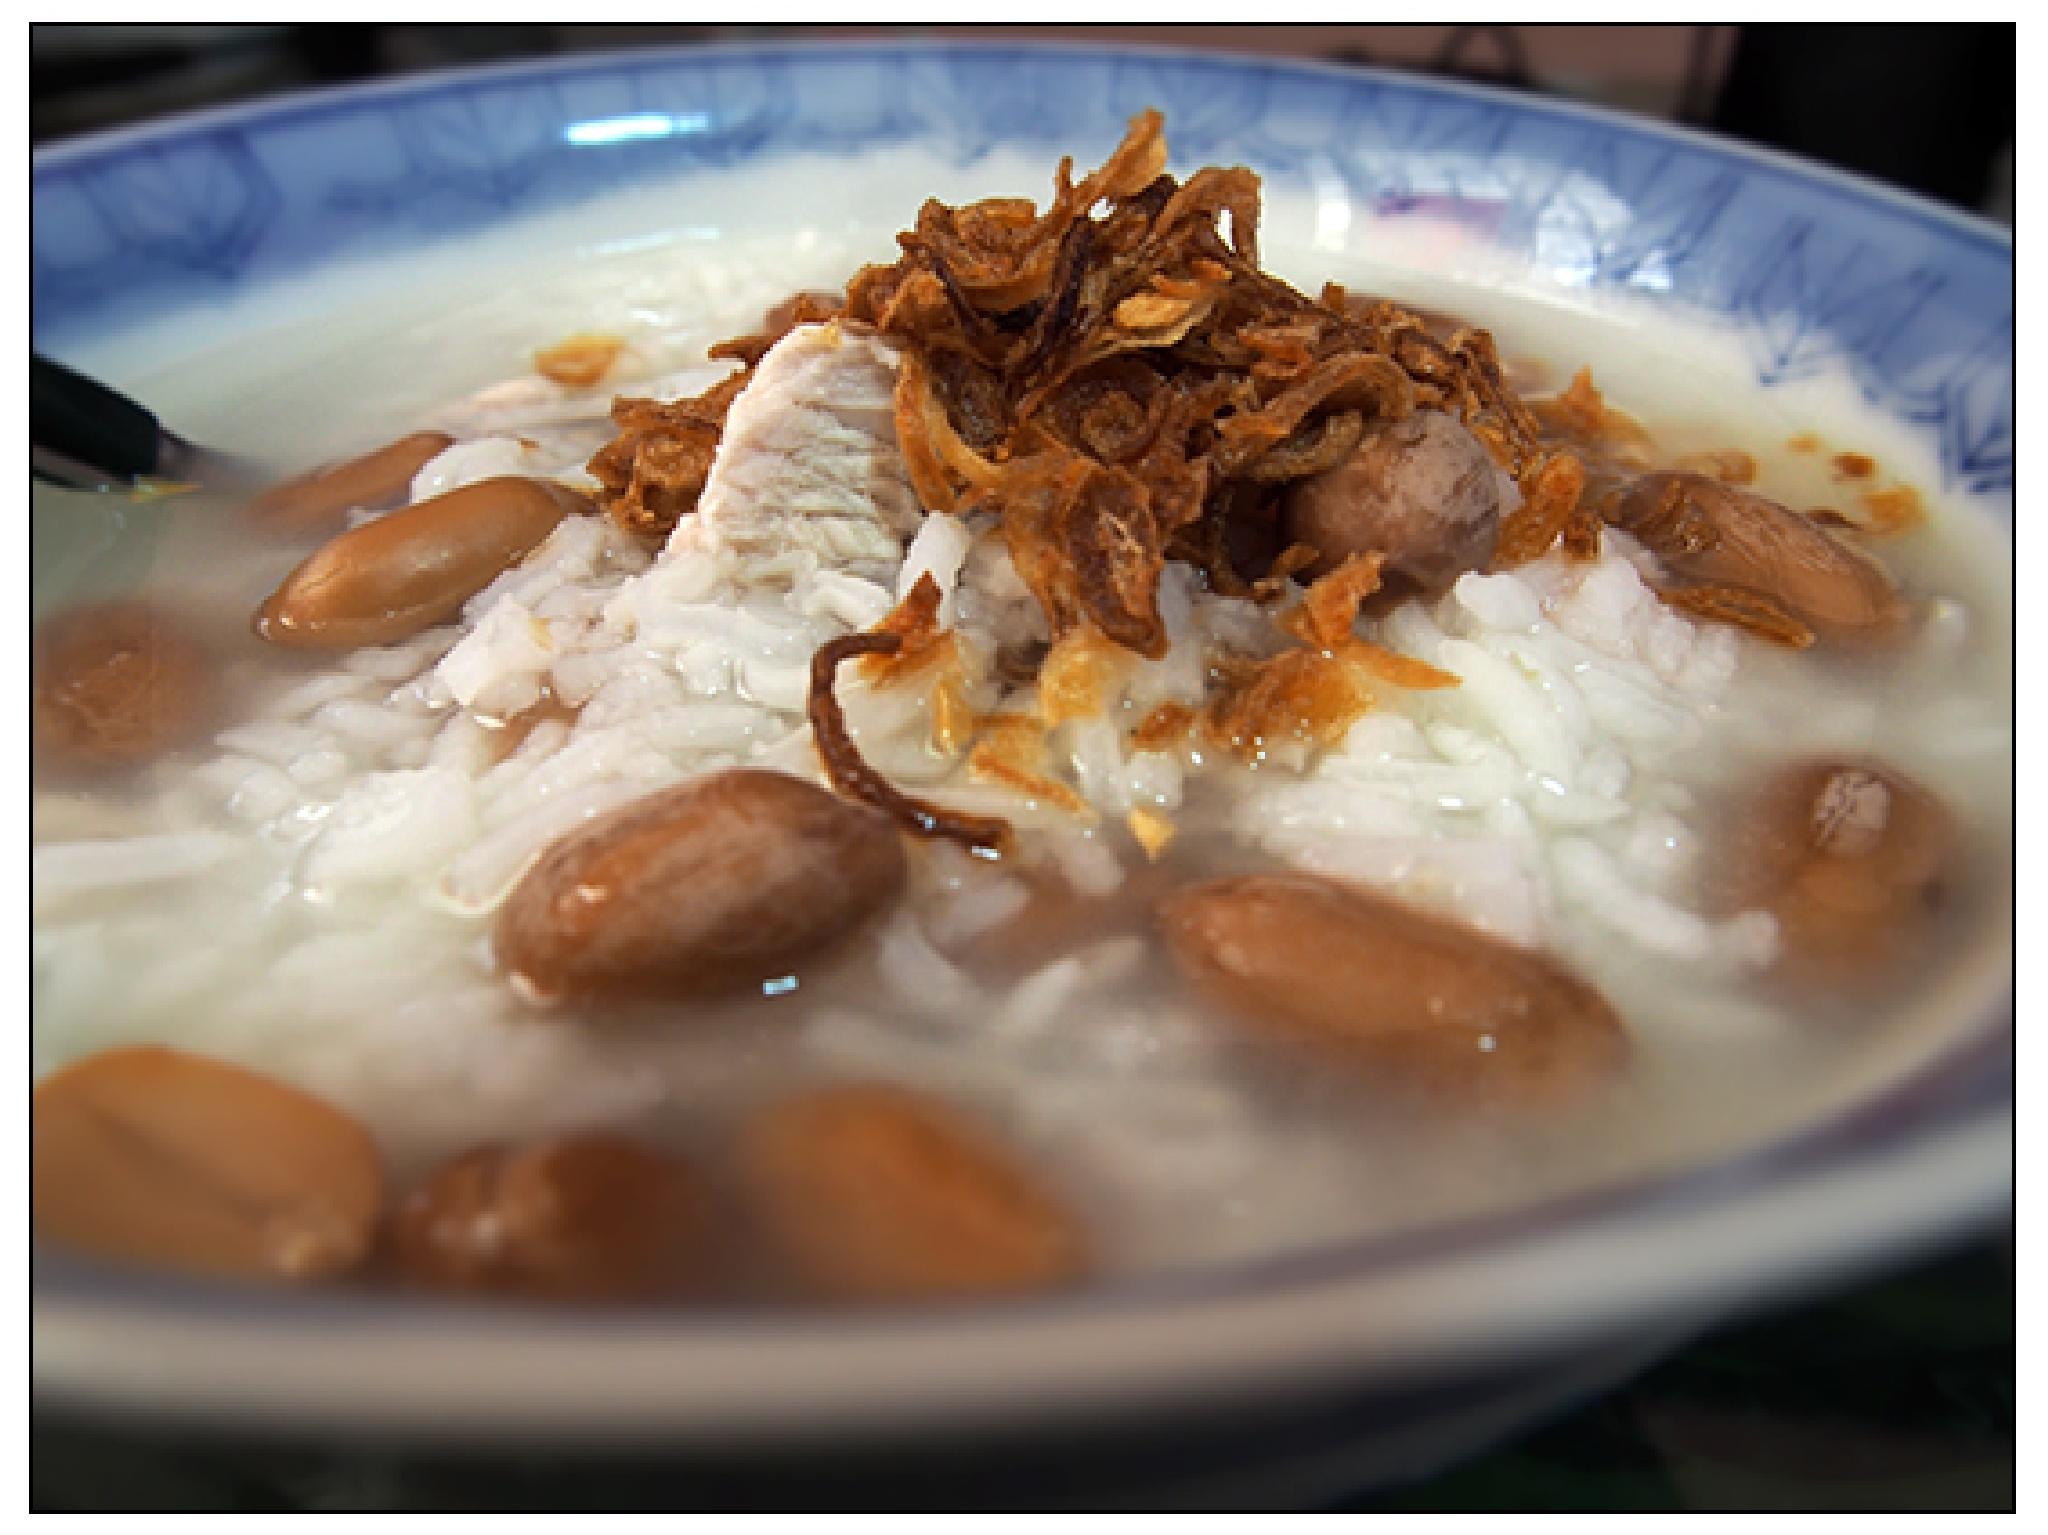 Chinese Peanuts Porridge by jessersim